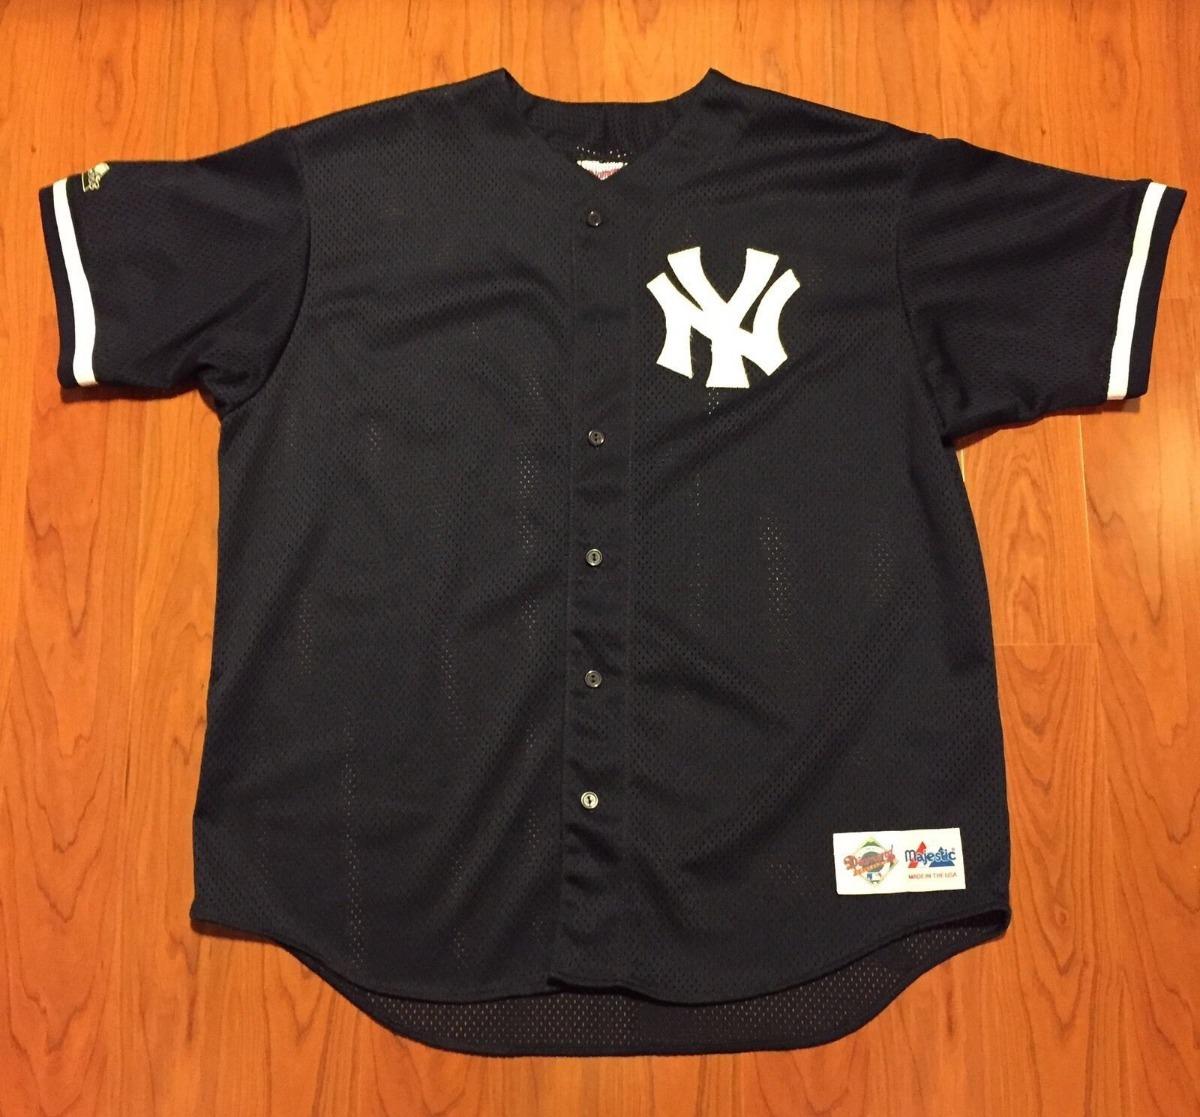 b3d5fc49eb6a2 camiseta beisbol baseball yankees new york majestic mets. Cargando zoom.